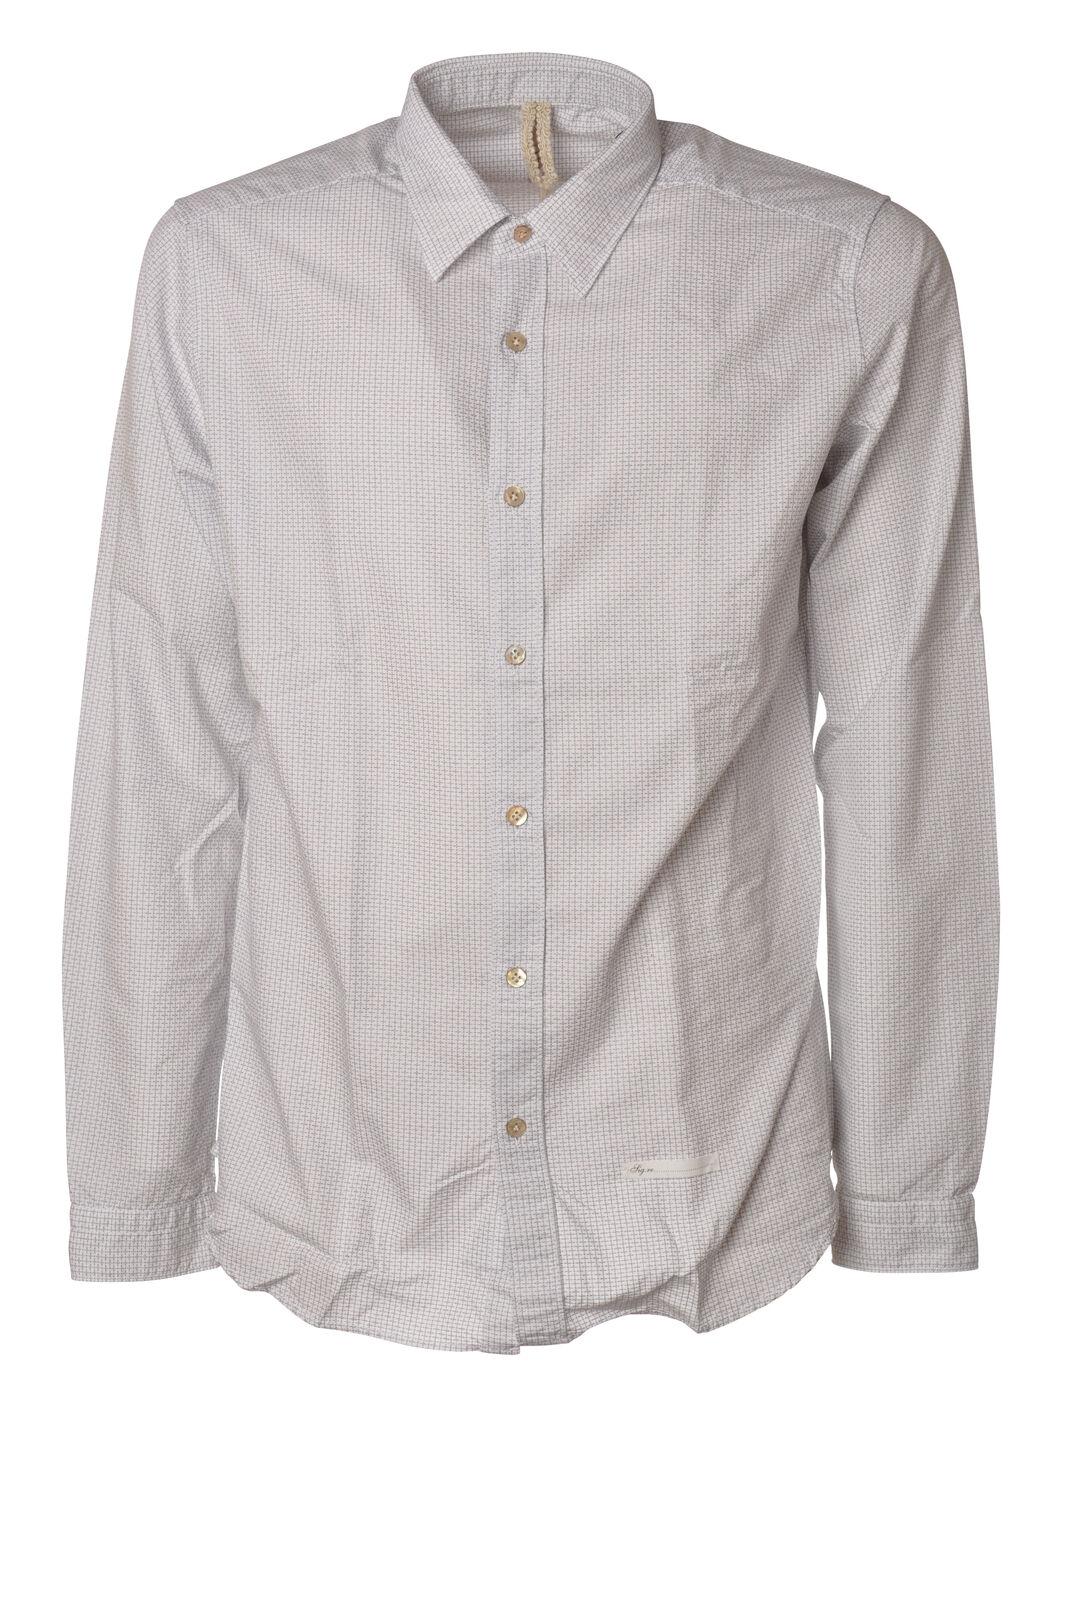 Dnl - Shirts-Shirt - Man - White - 5634509C192628